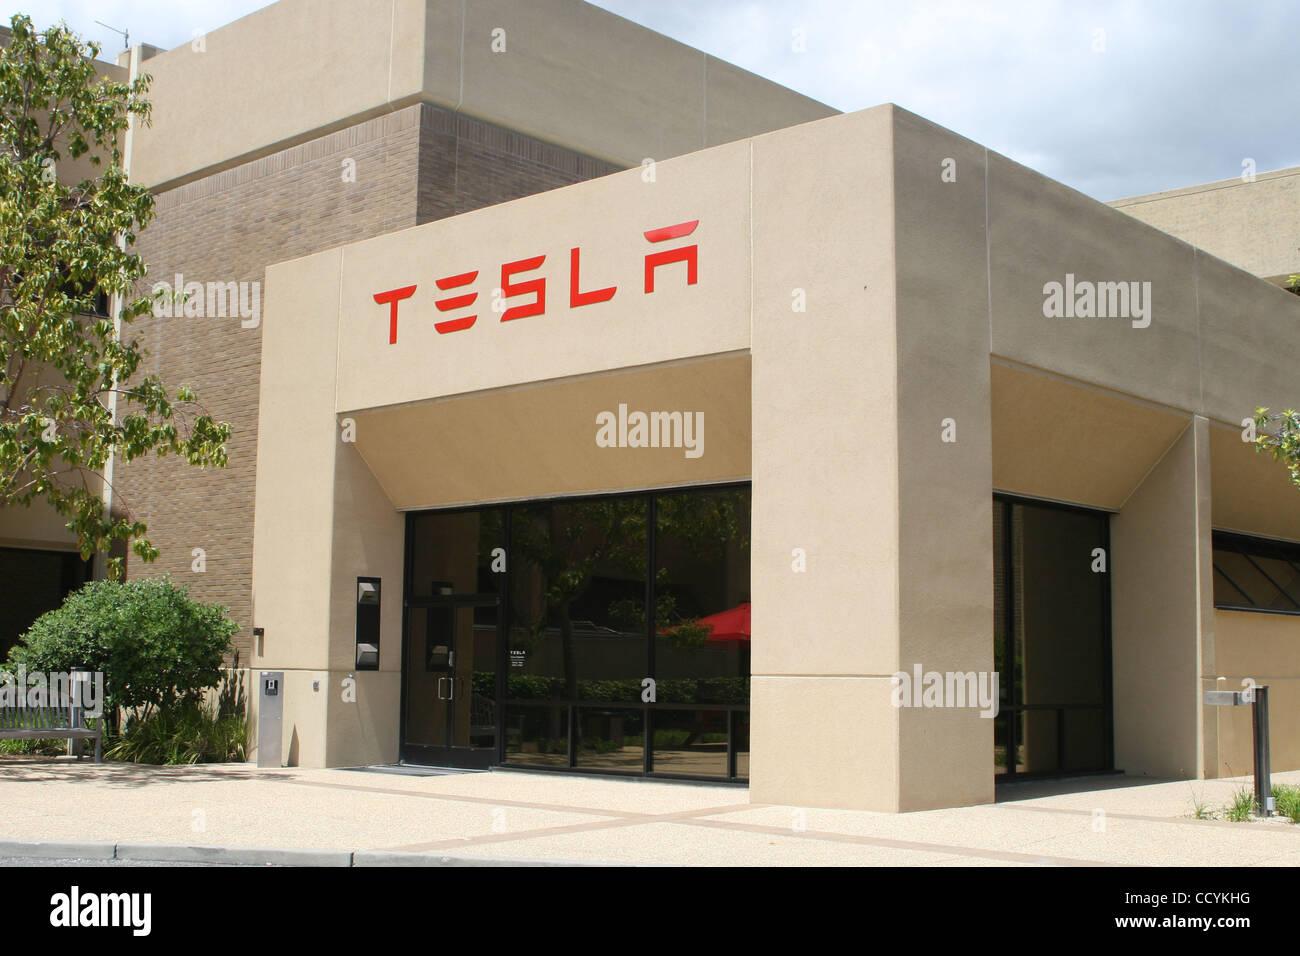 May 28 2010 palo alto california usa worldwide for Tesla motors palo alto